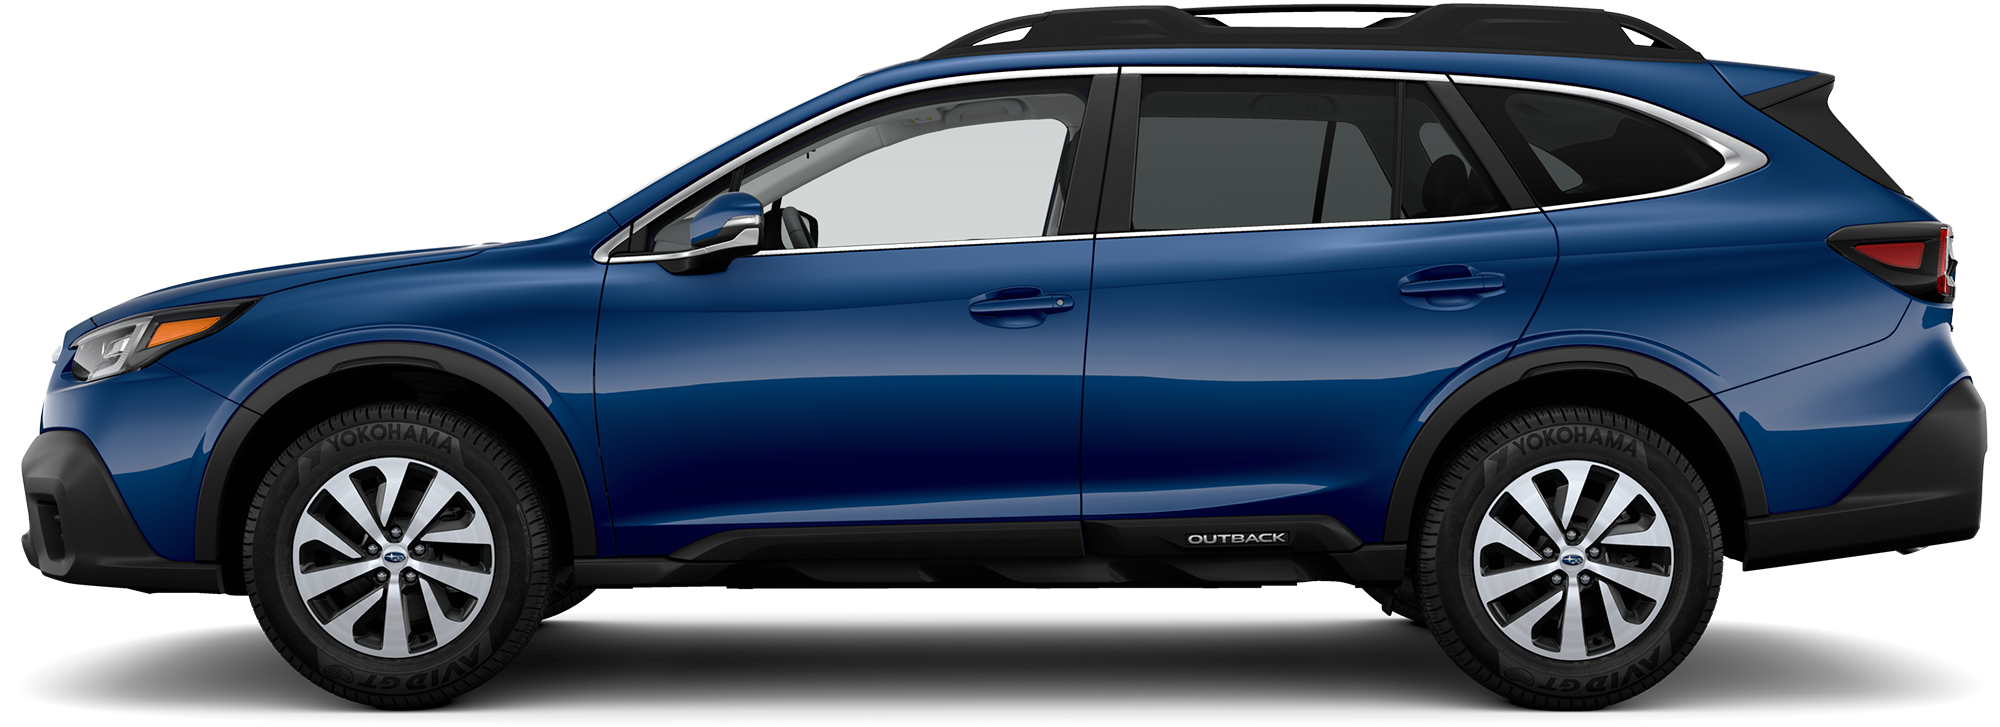 2022 Subaru Outback SUV Premium